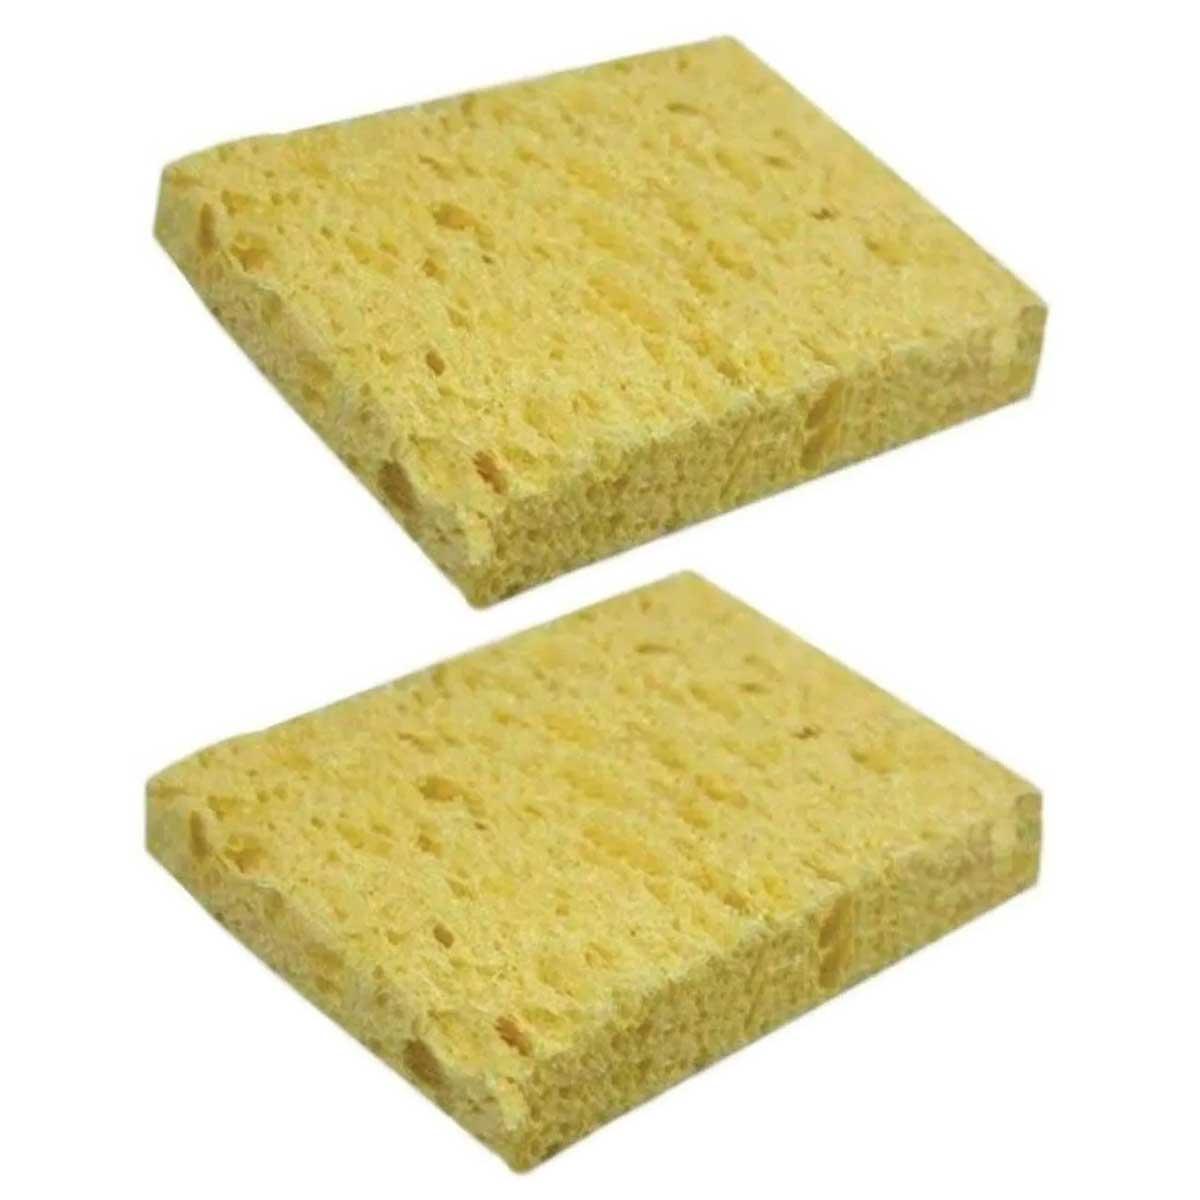 2x Esponja Vegetal para Limpeza de Ferro de Solda